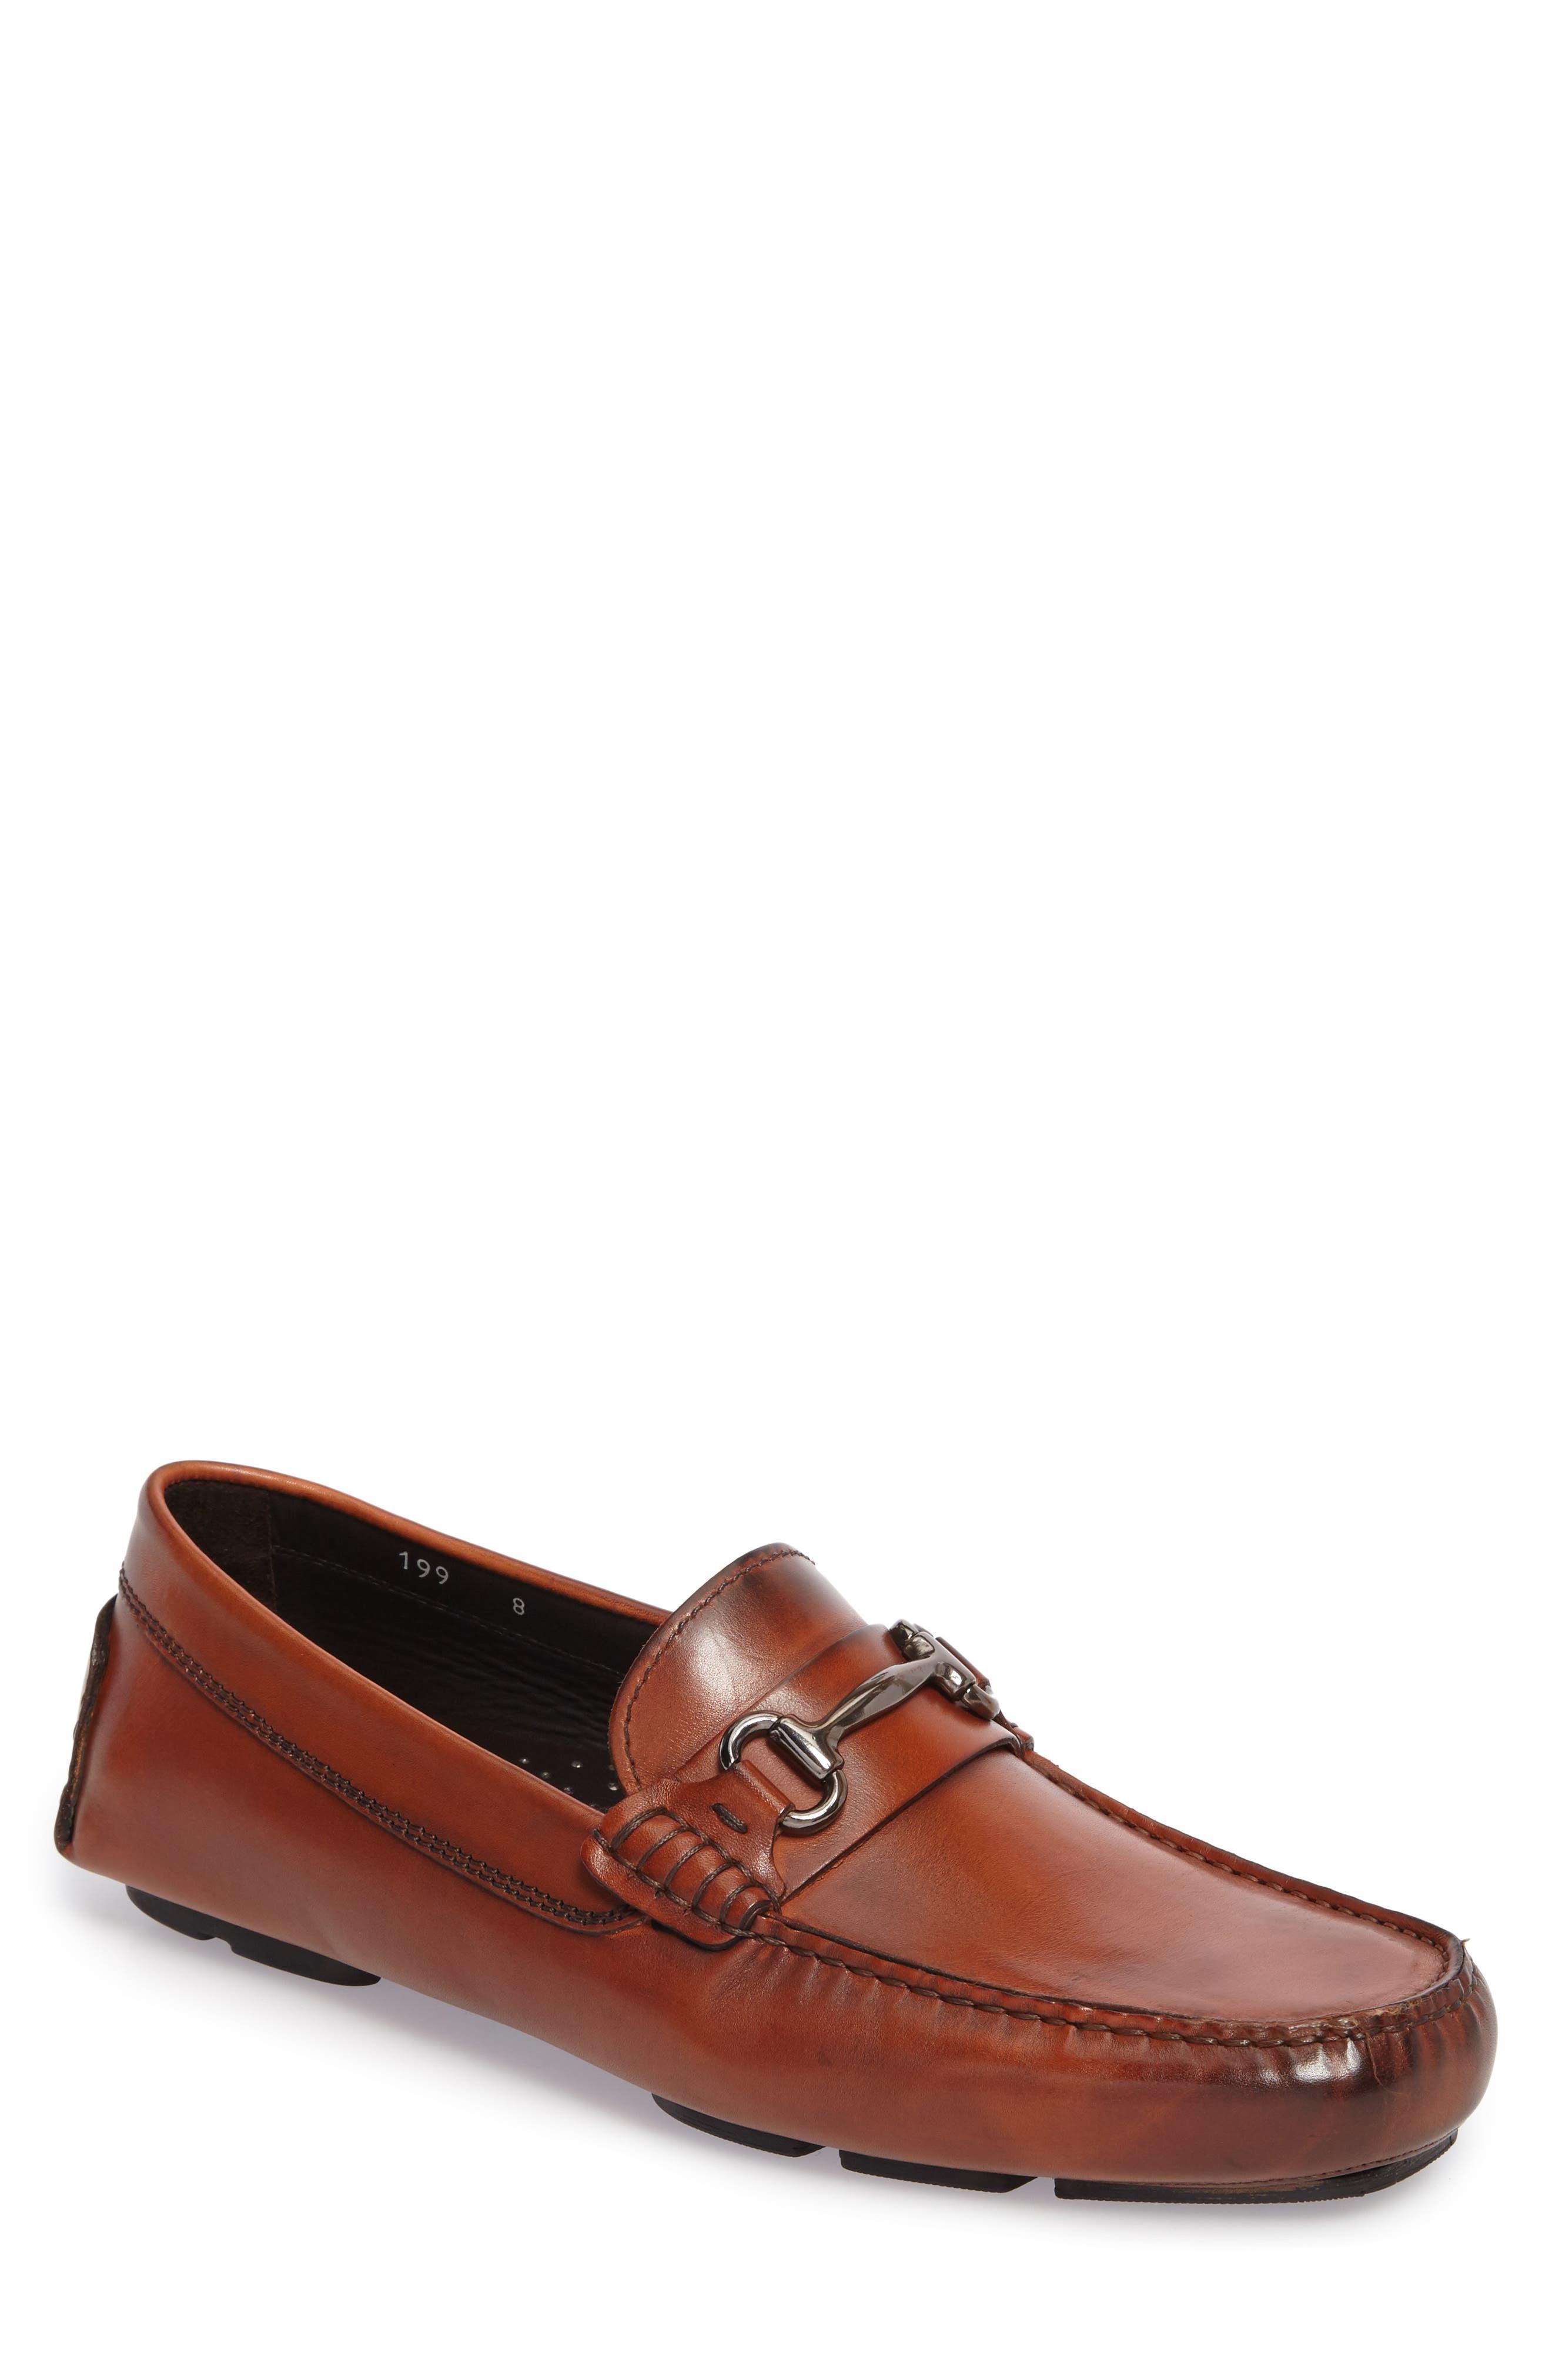 Main Image - To Boot New York Del Amo Driving Shoe (Men)